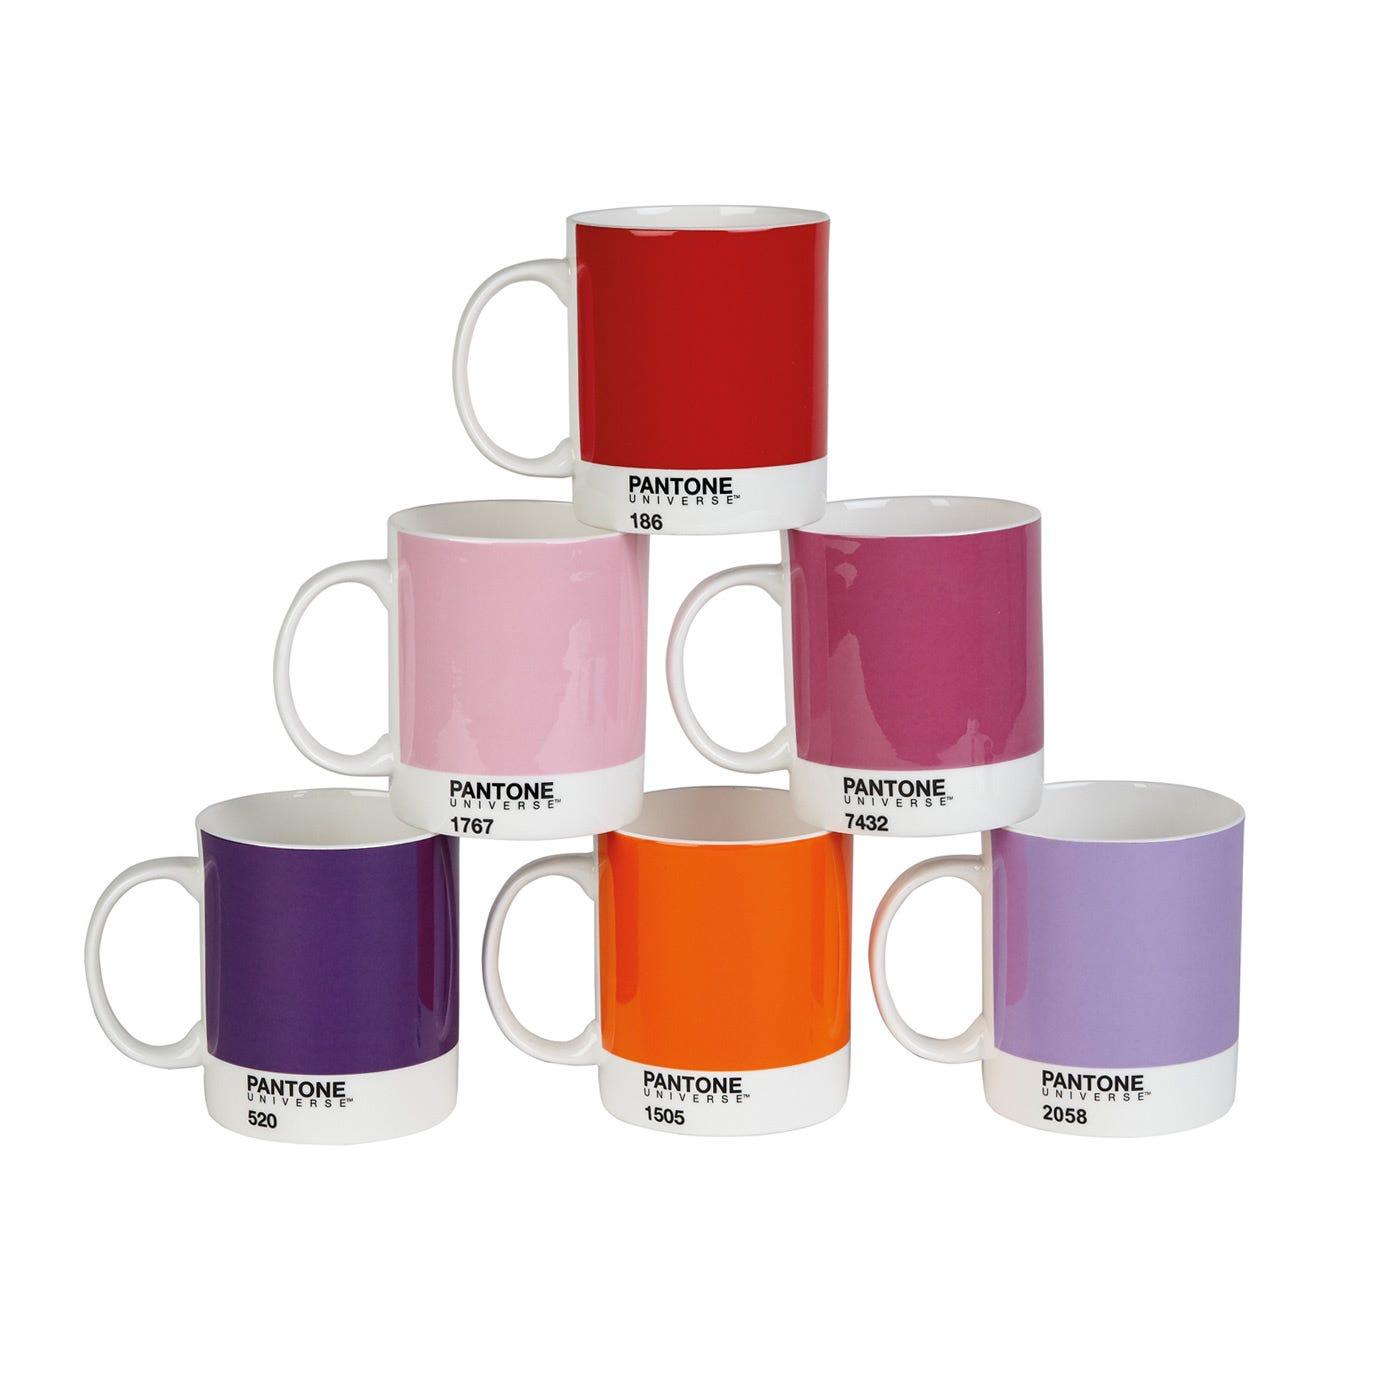 Pantone Pantone Mug